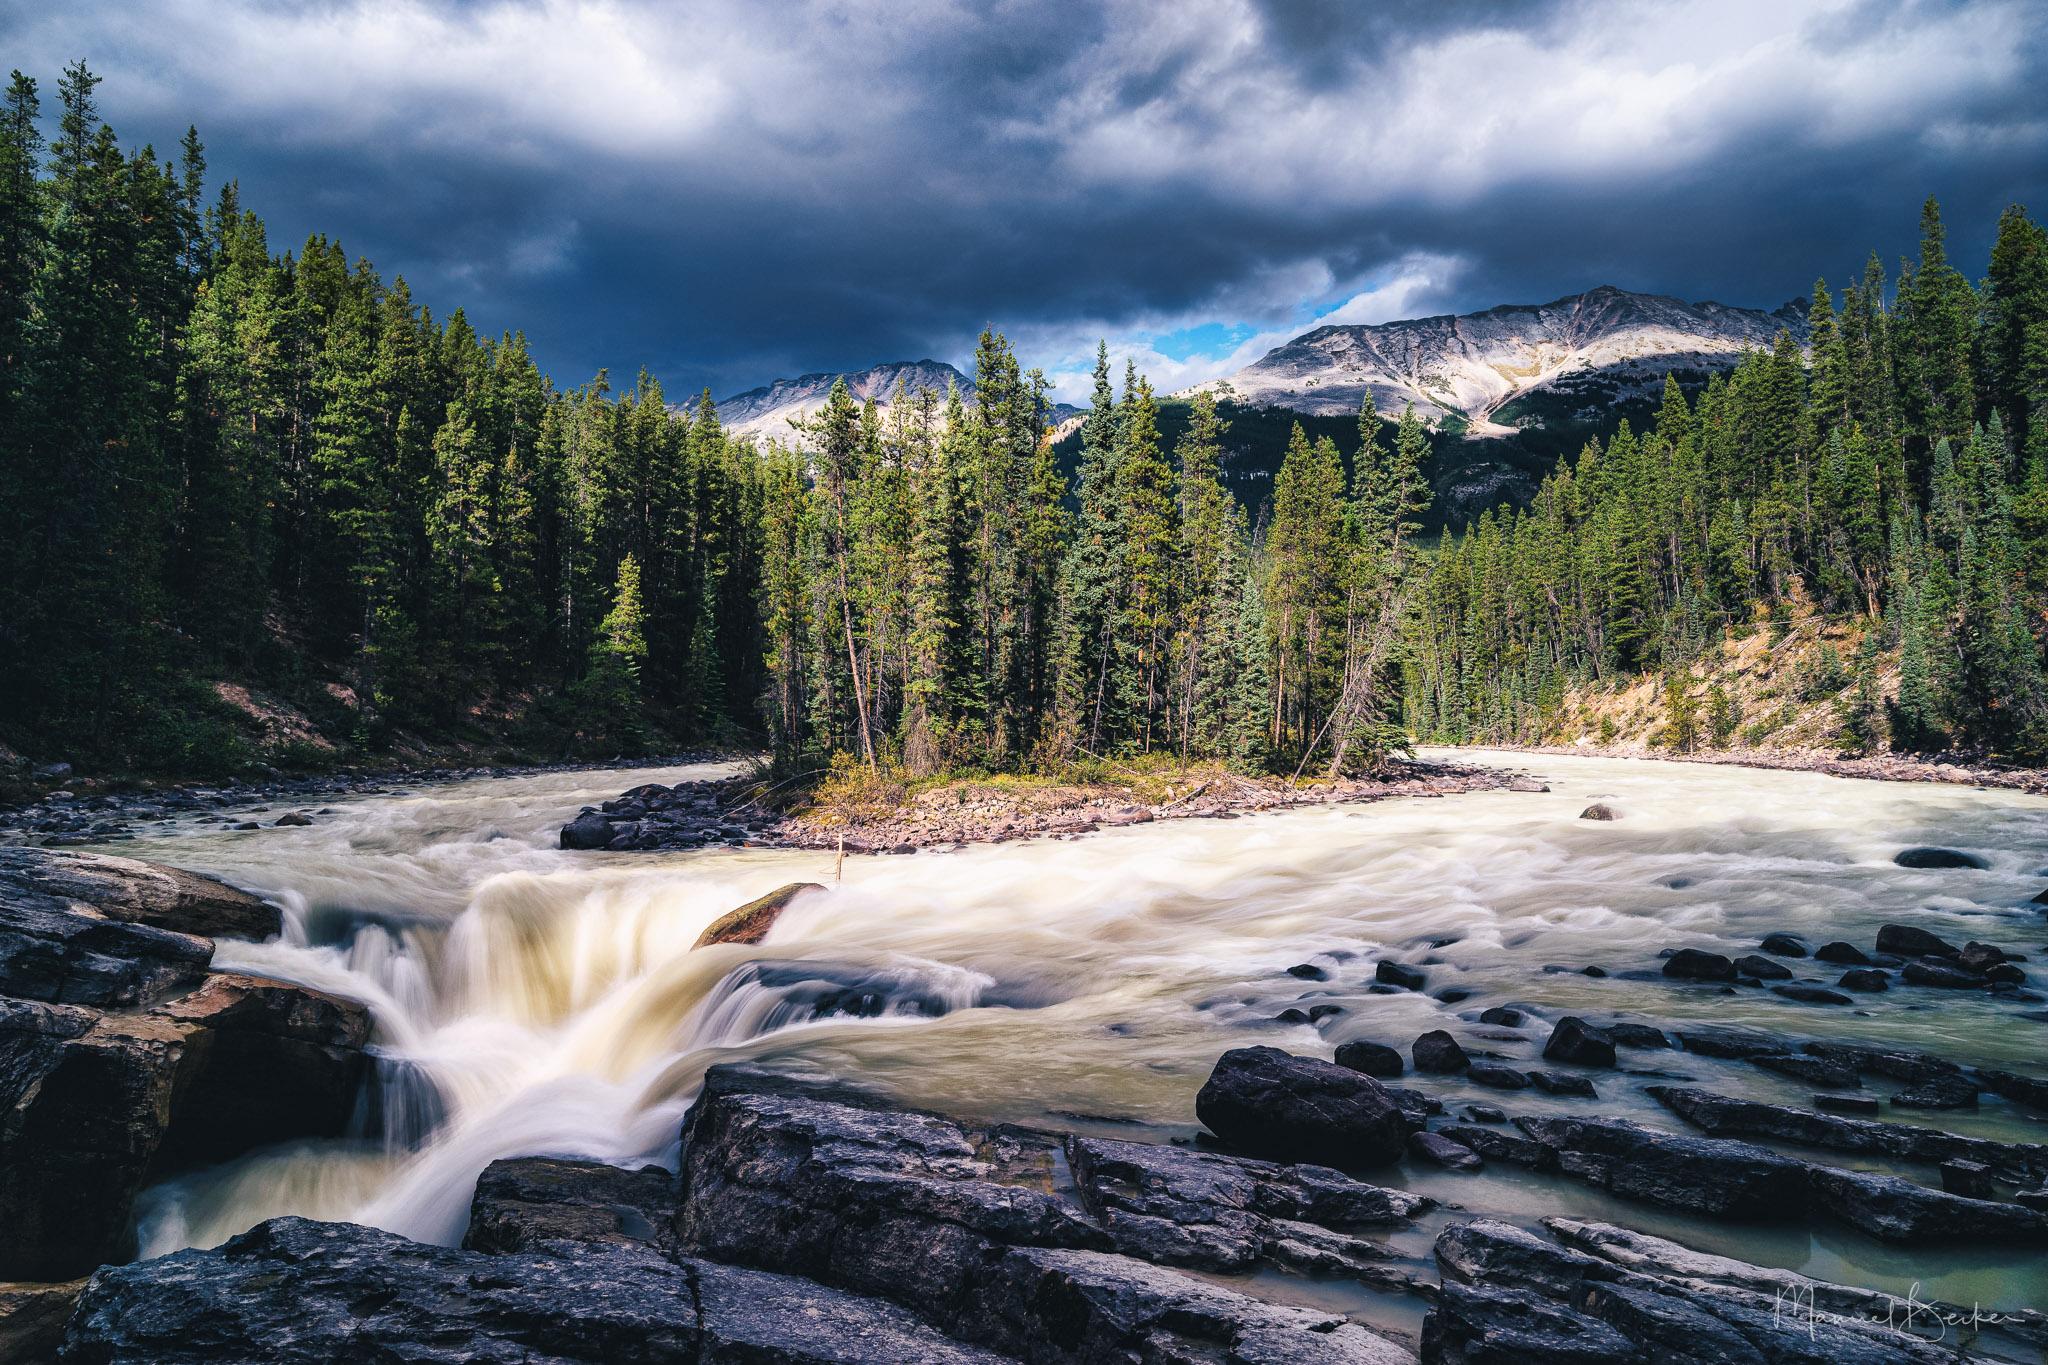 Sunwapta Falls from nearby, Canada